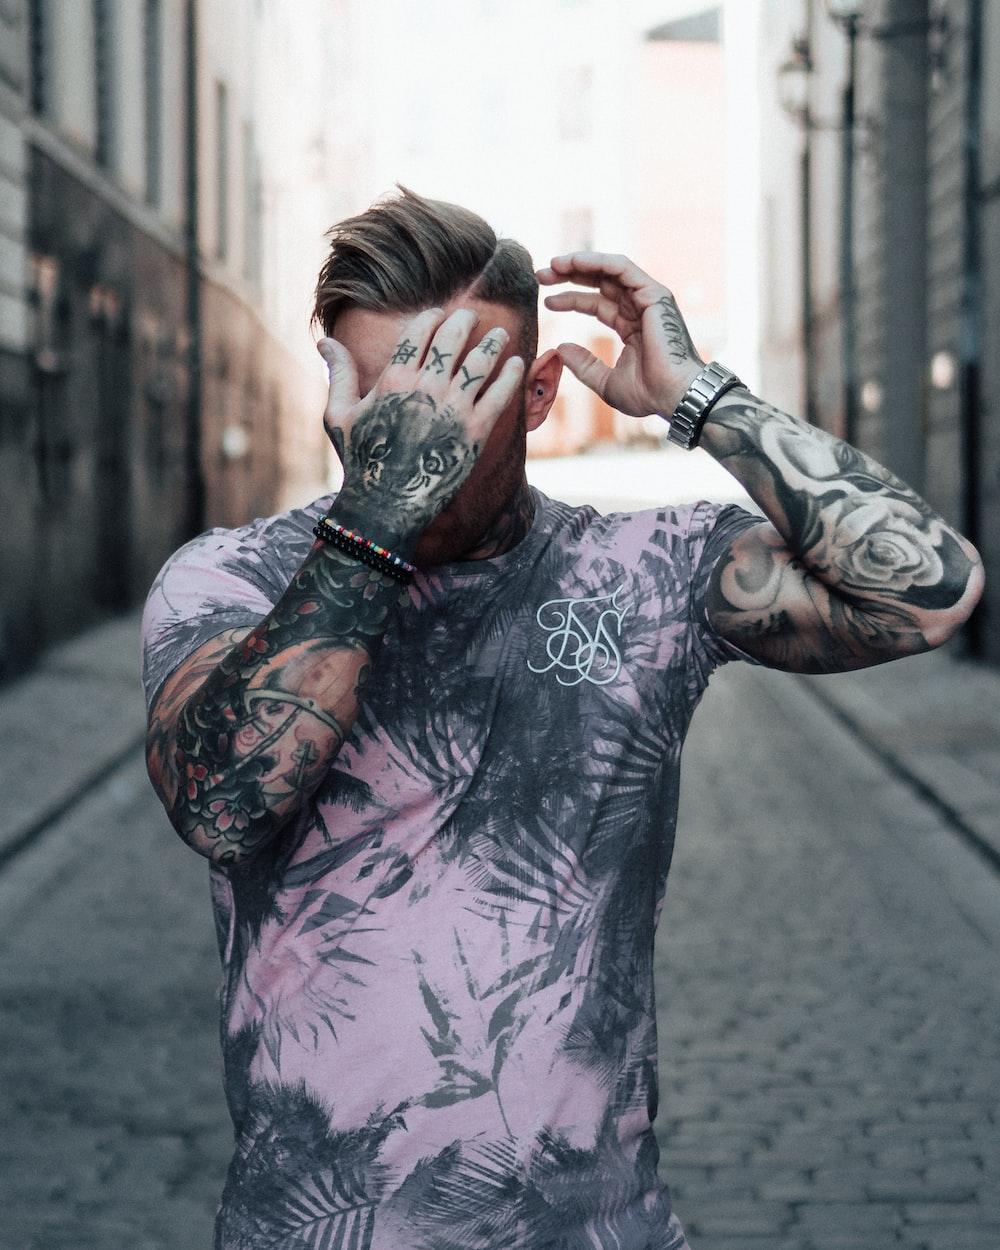 man wearing gray and black crew-neck t-shirt